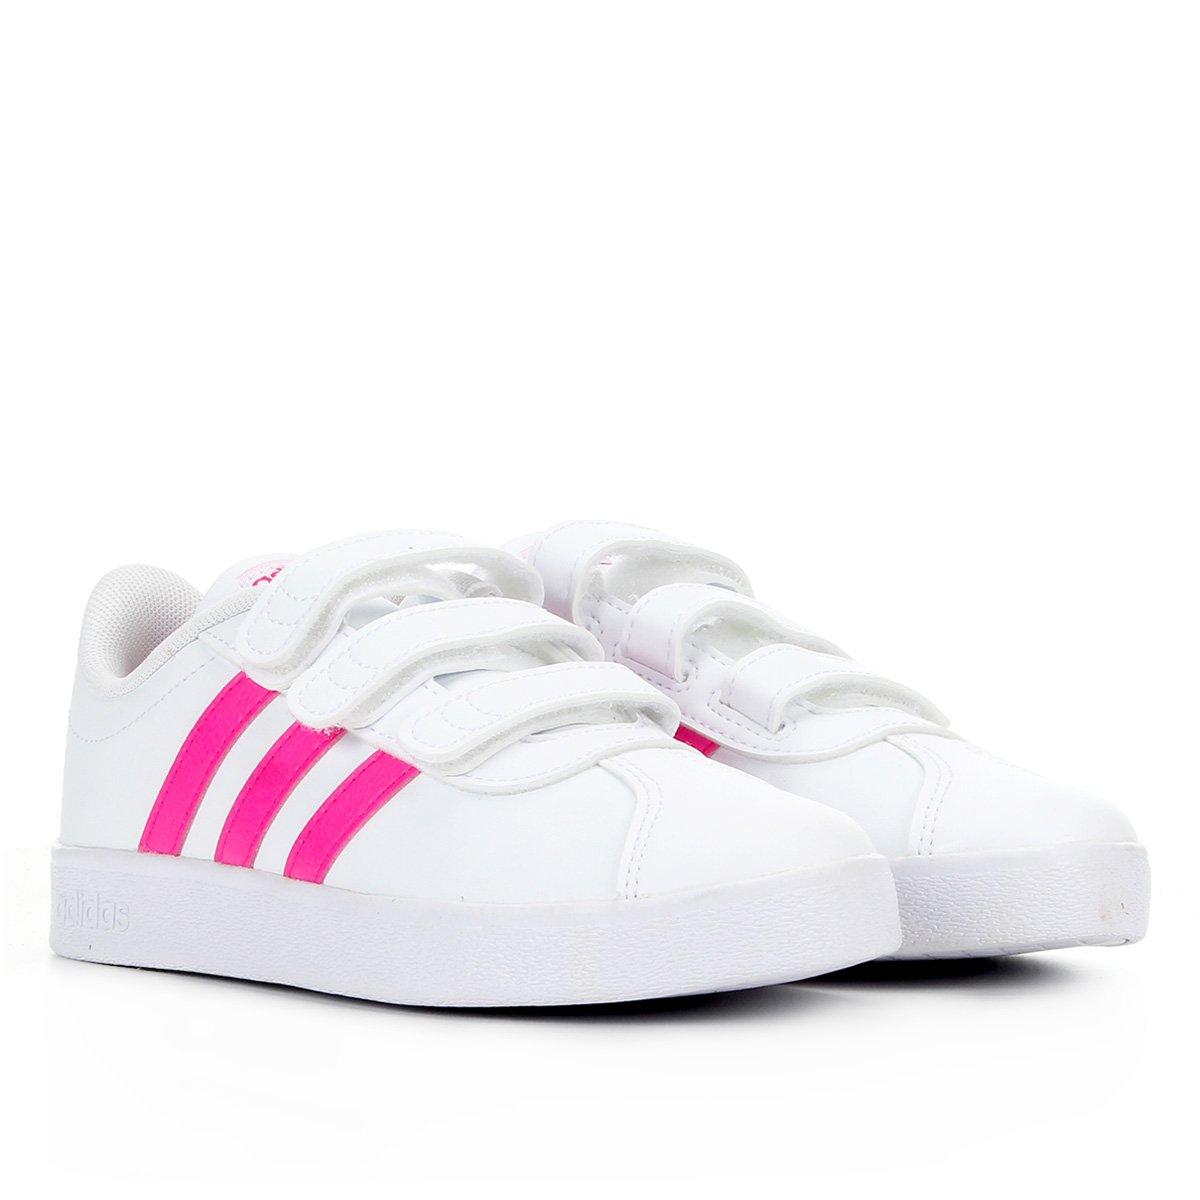 Tênis Infantil Adidas Vl Court 2.0 Cmf C